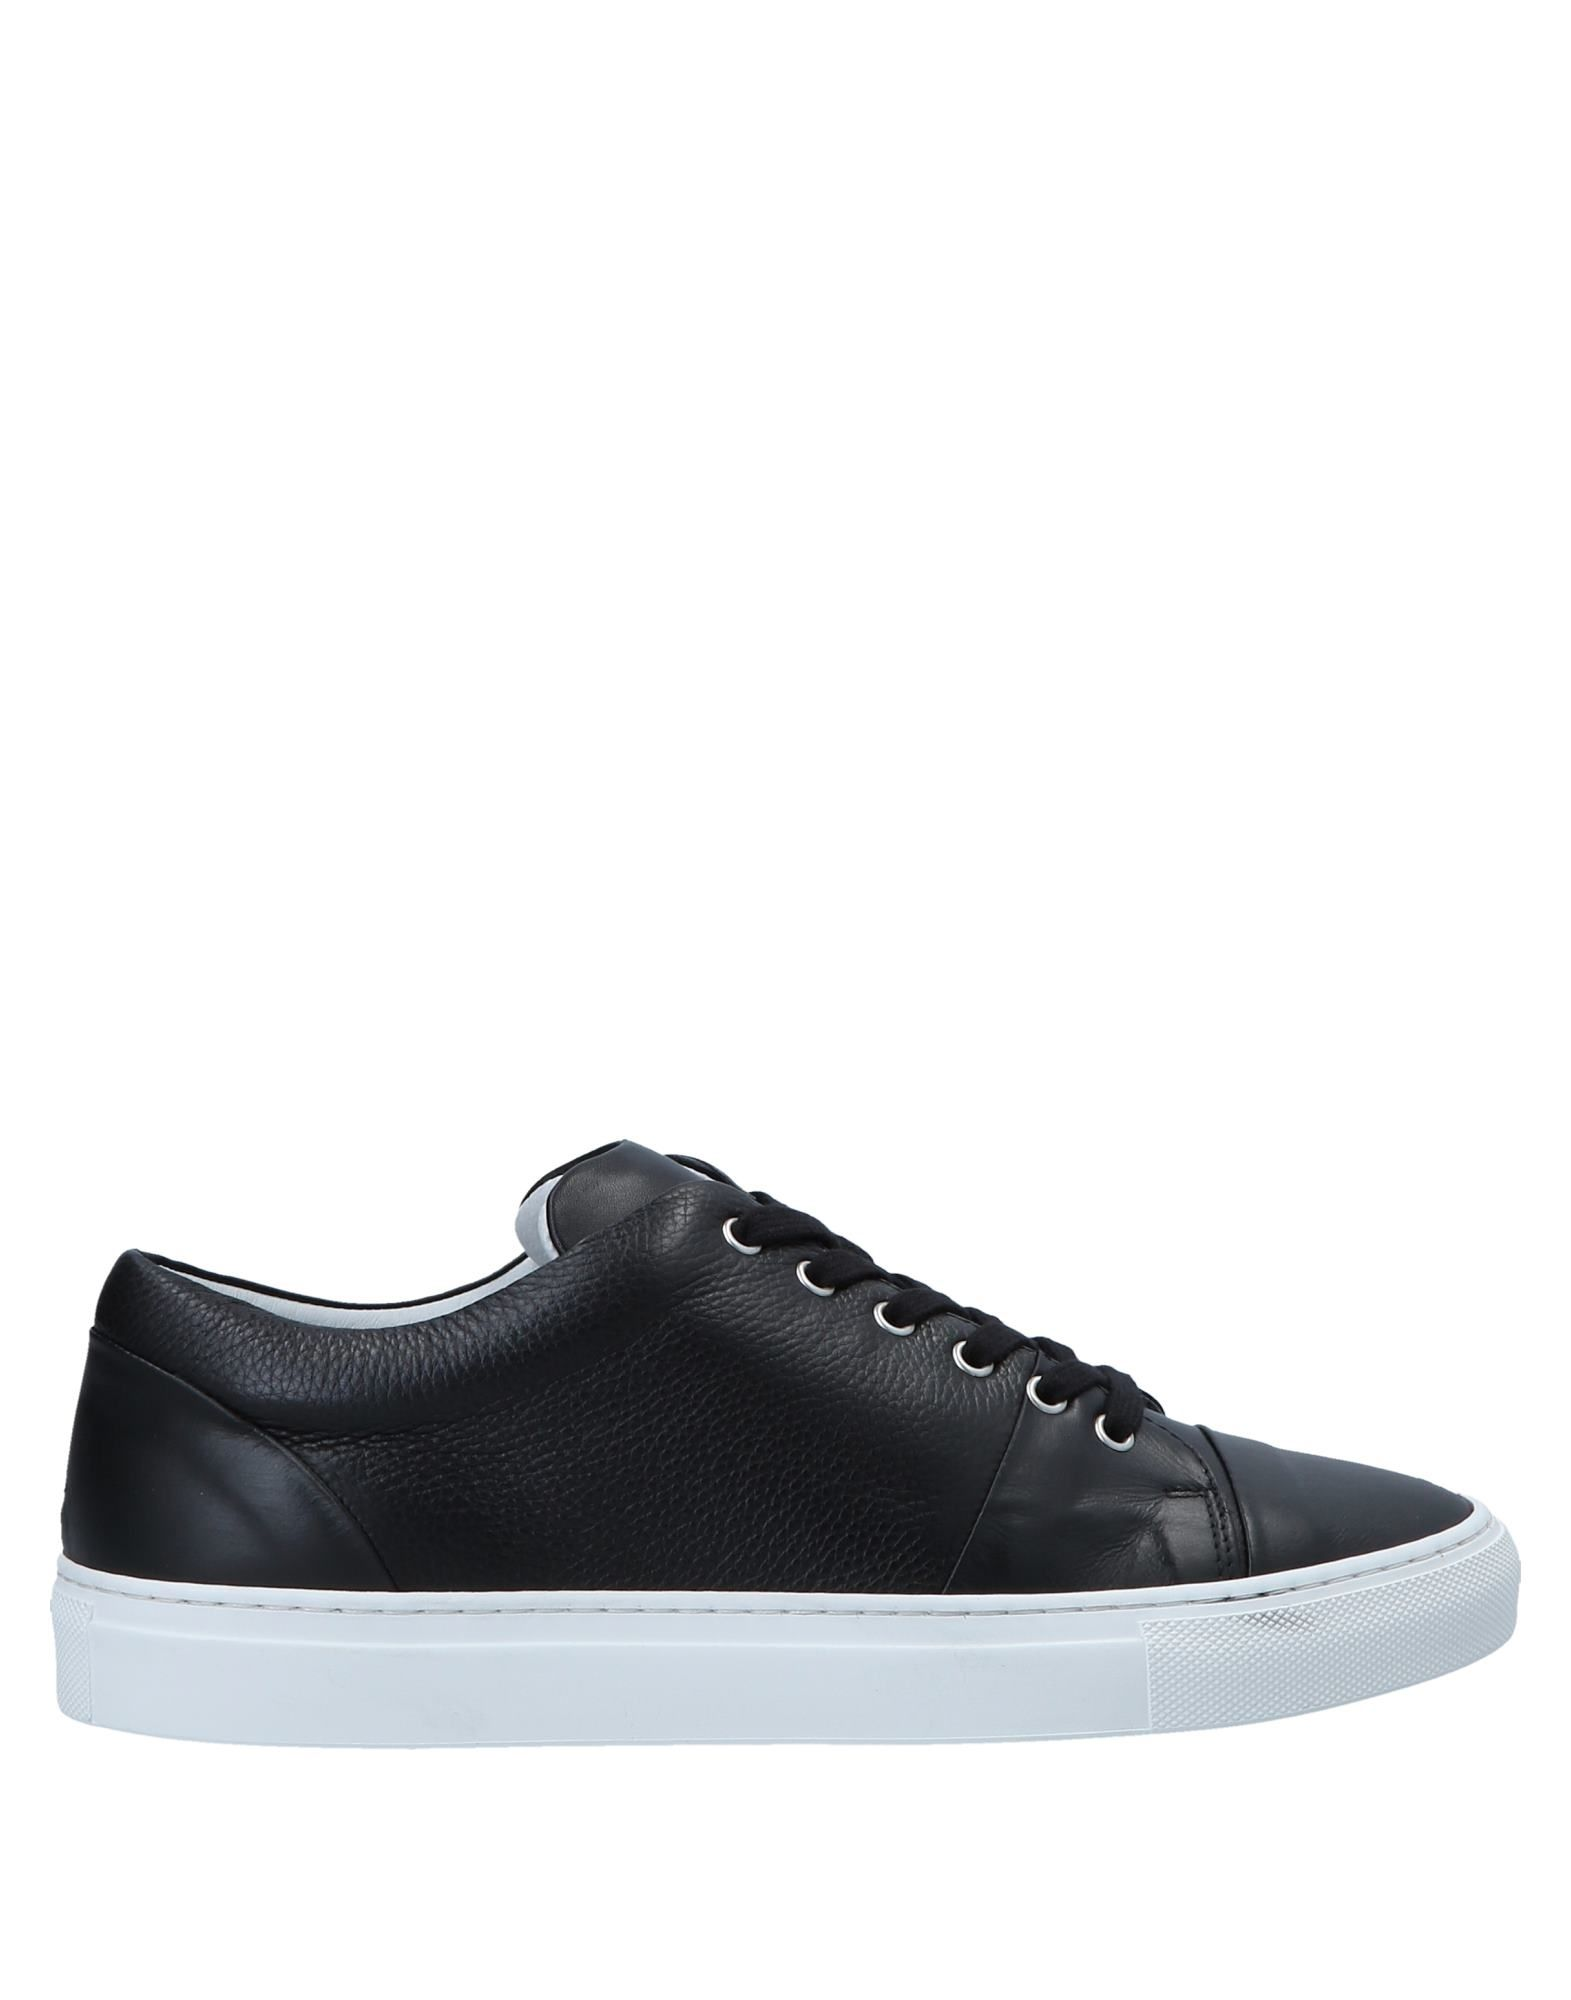 Fabiano Ricci Sneakers Herren  11548483FC Gute Qualität beliebte Schuhe